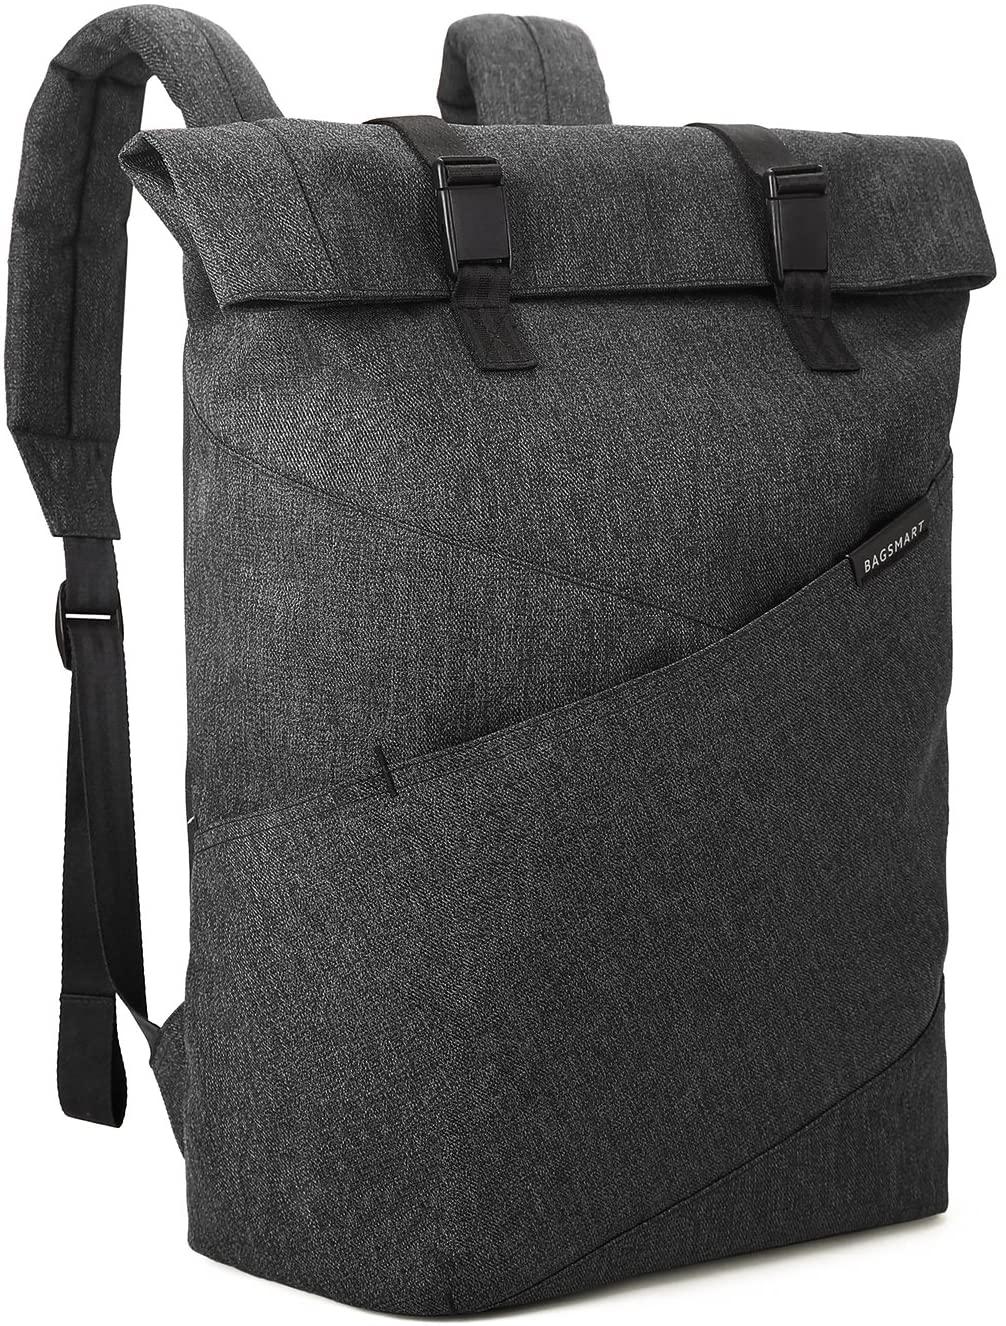 BAGSMART Laptop Backpack Travel Rolltop Backpack College School Computer Bag Fits 15.6 Inch Laptop and Notebook, Black